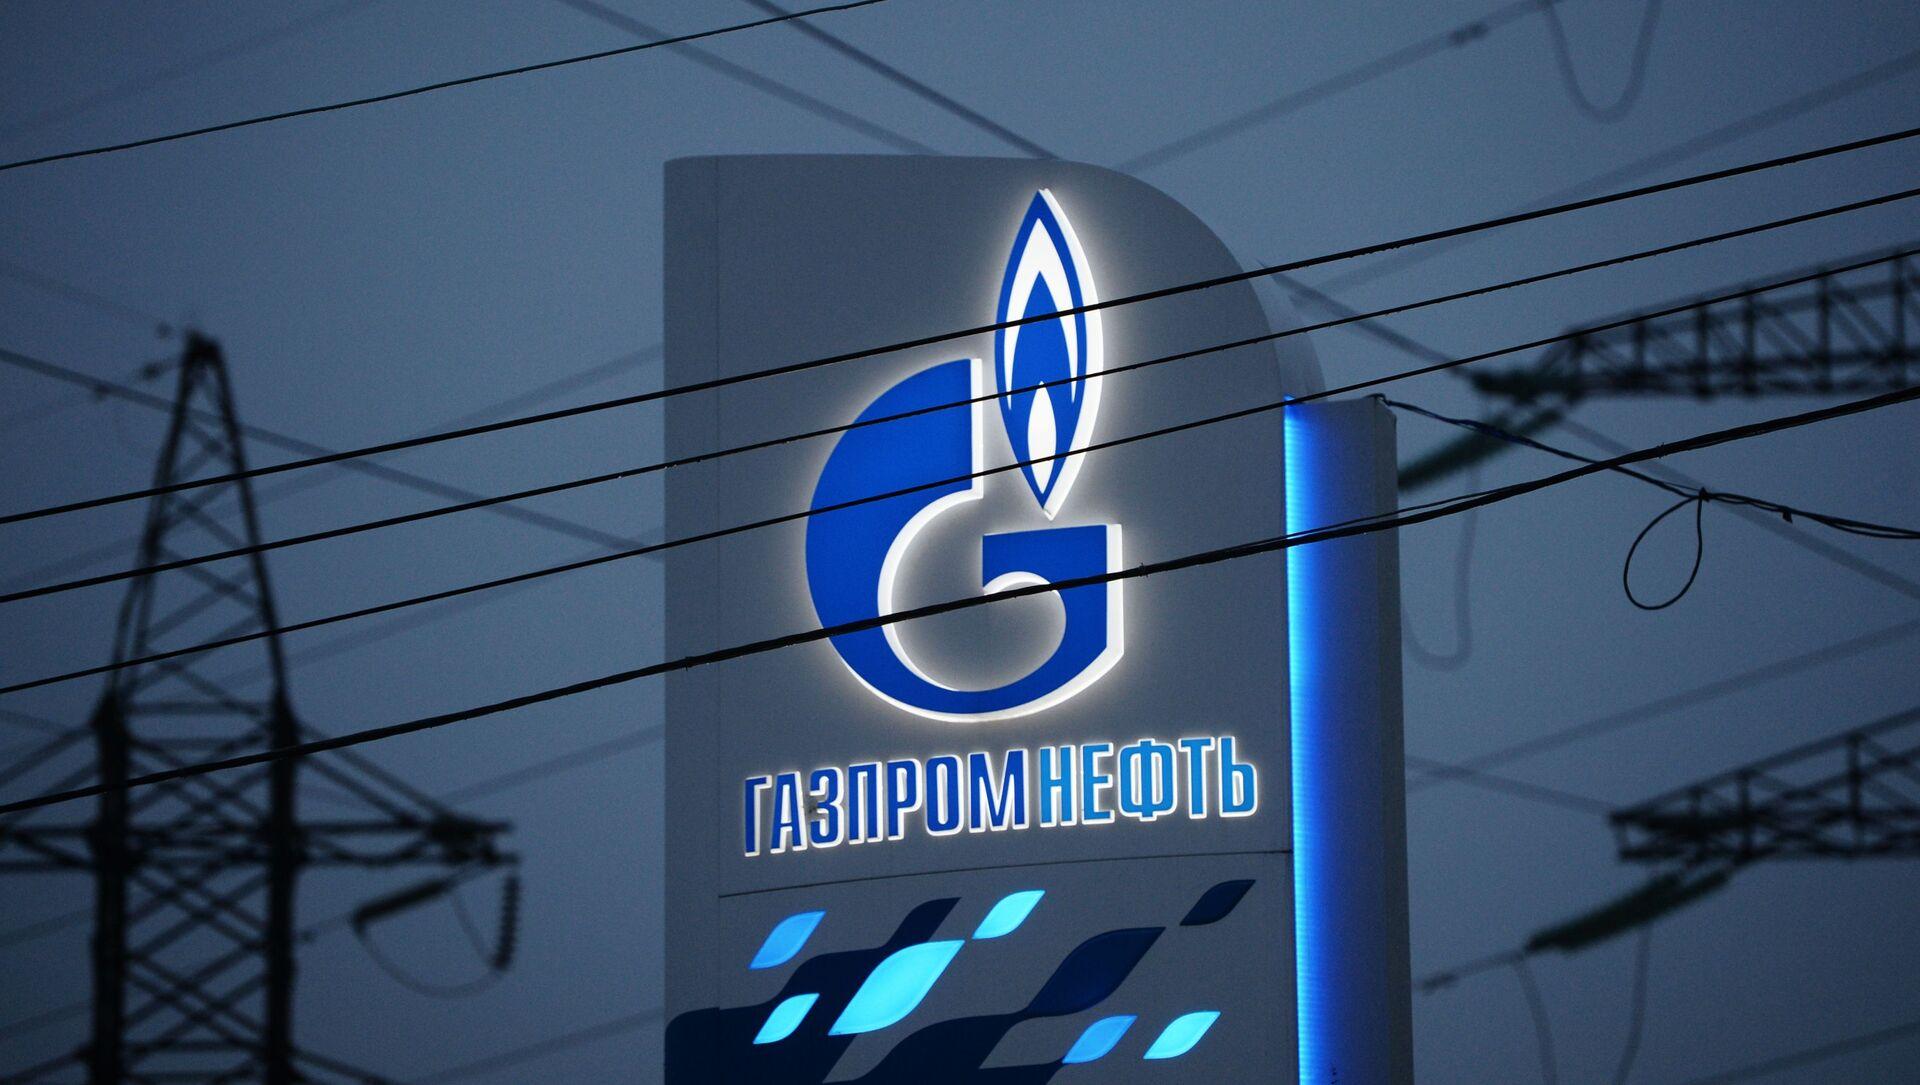 Logo de la empresa rusa Gazprom Neft - Sputnik Mundo, 1920, 08.02.2021